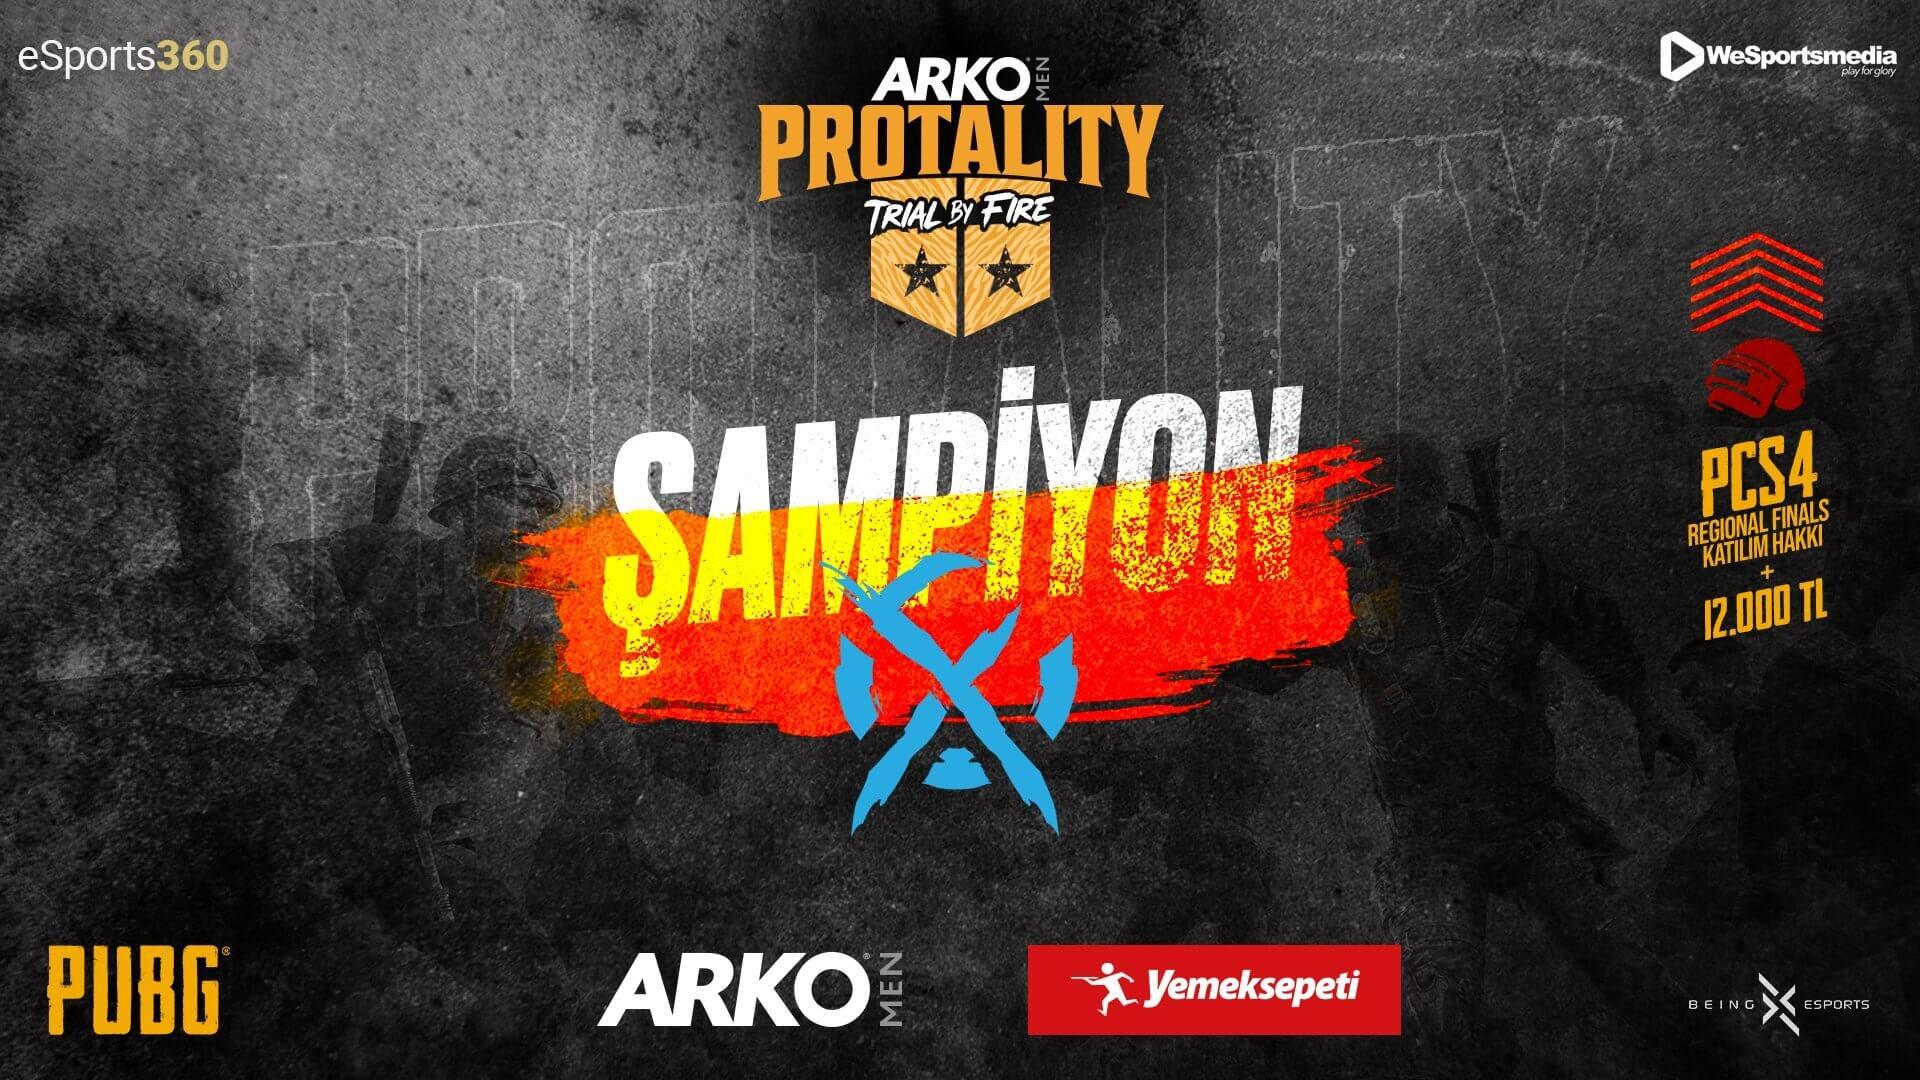 ARKO MEN PROTALITY: Trial by Fire şampiyonu Xflow Esports oldu